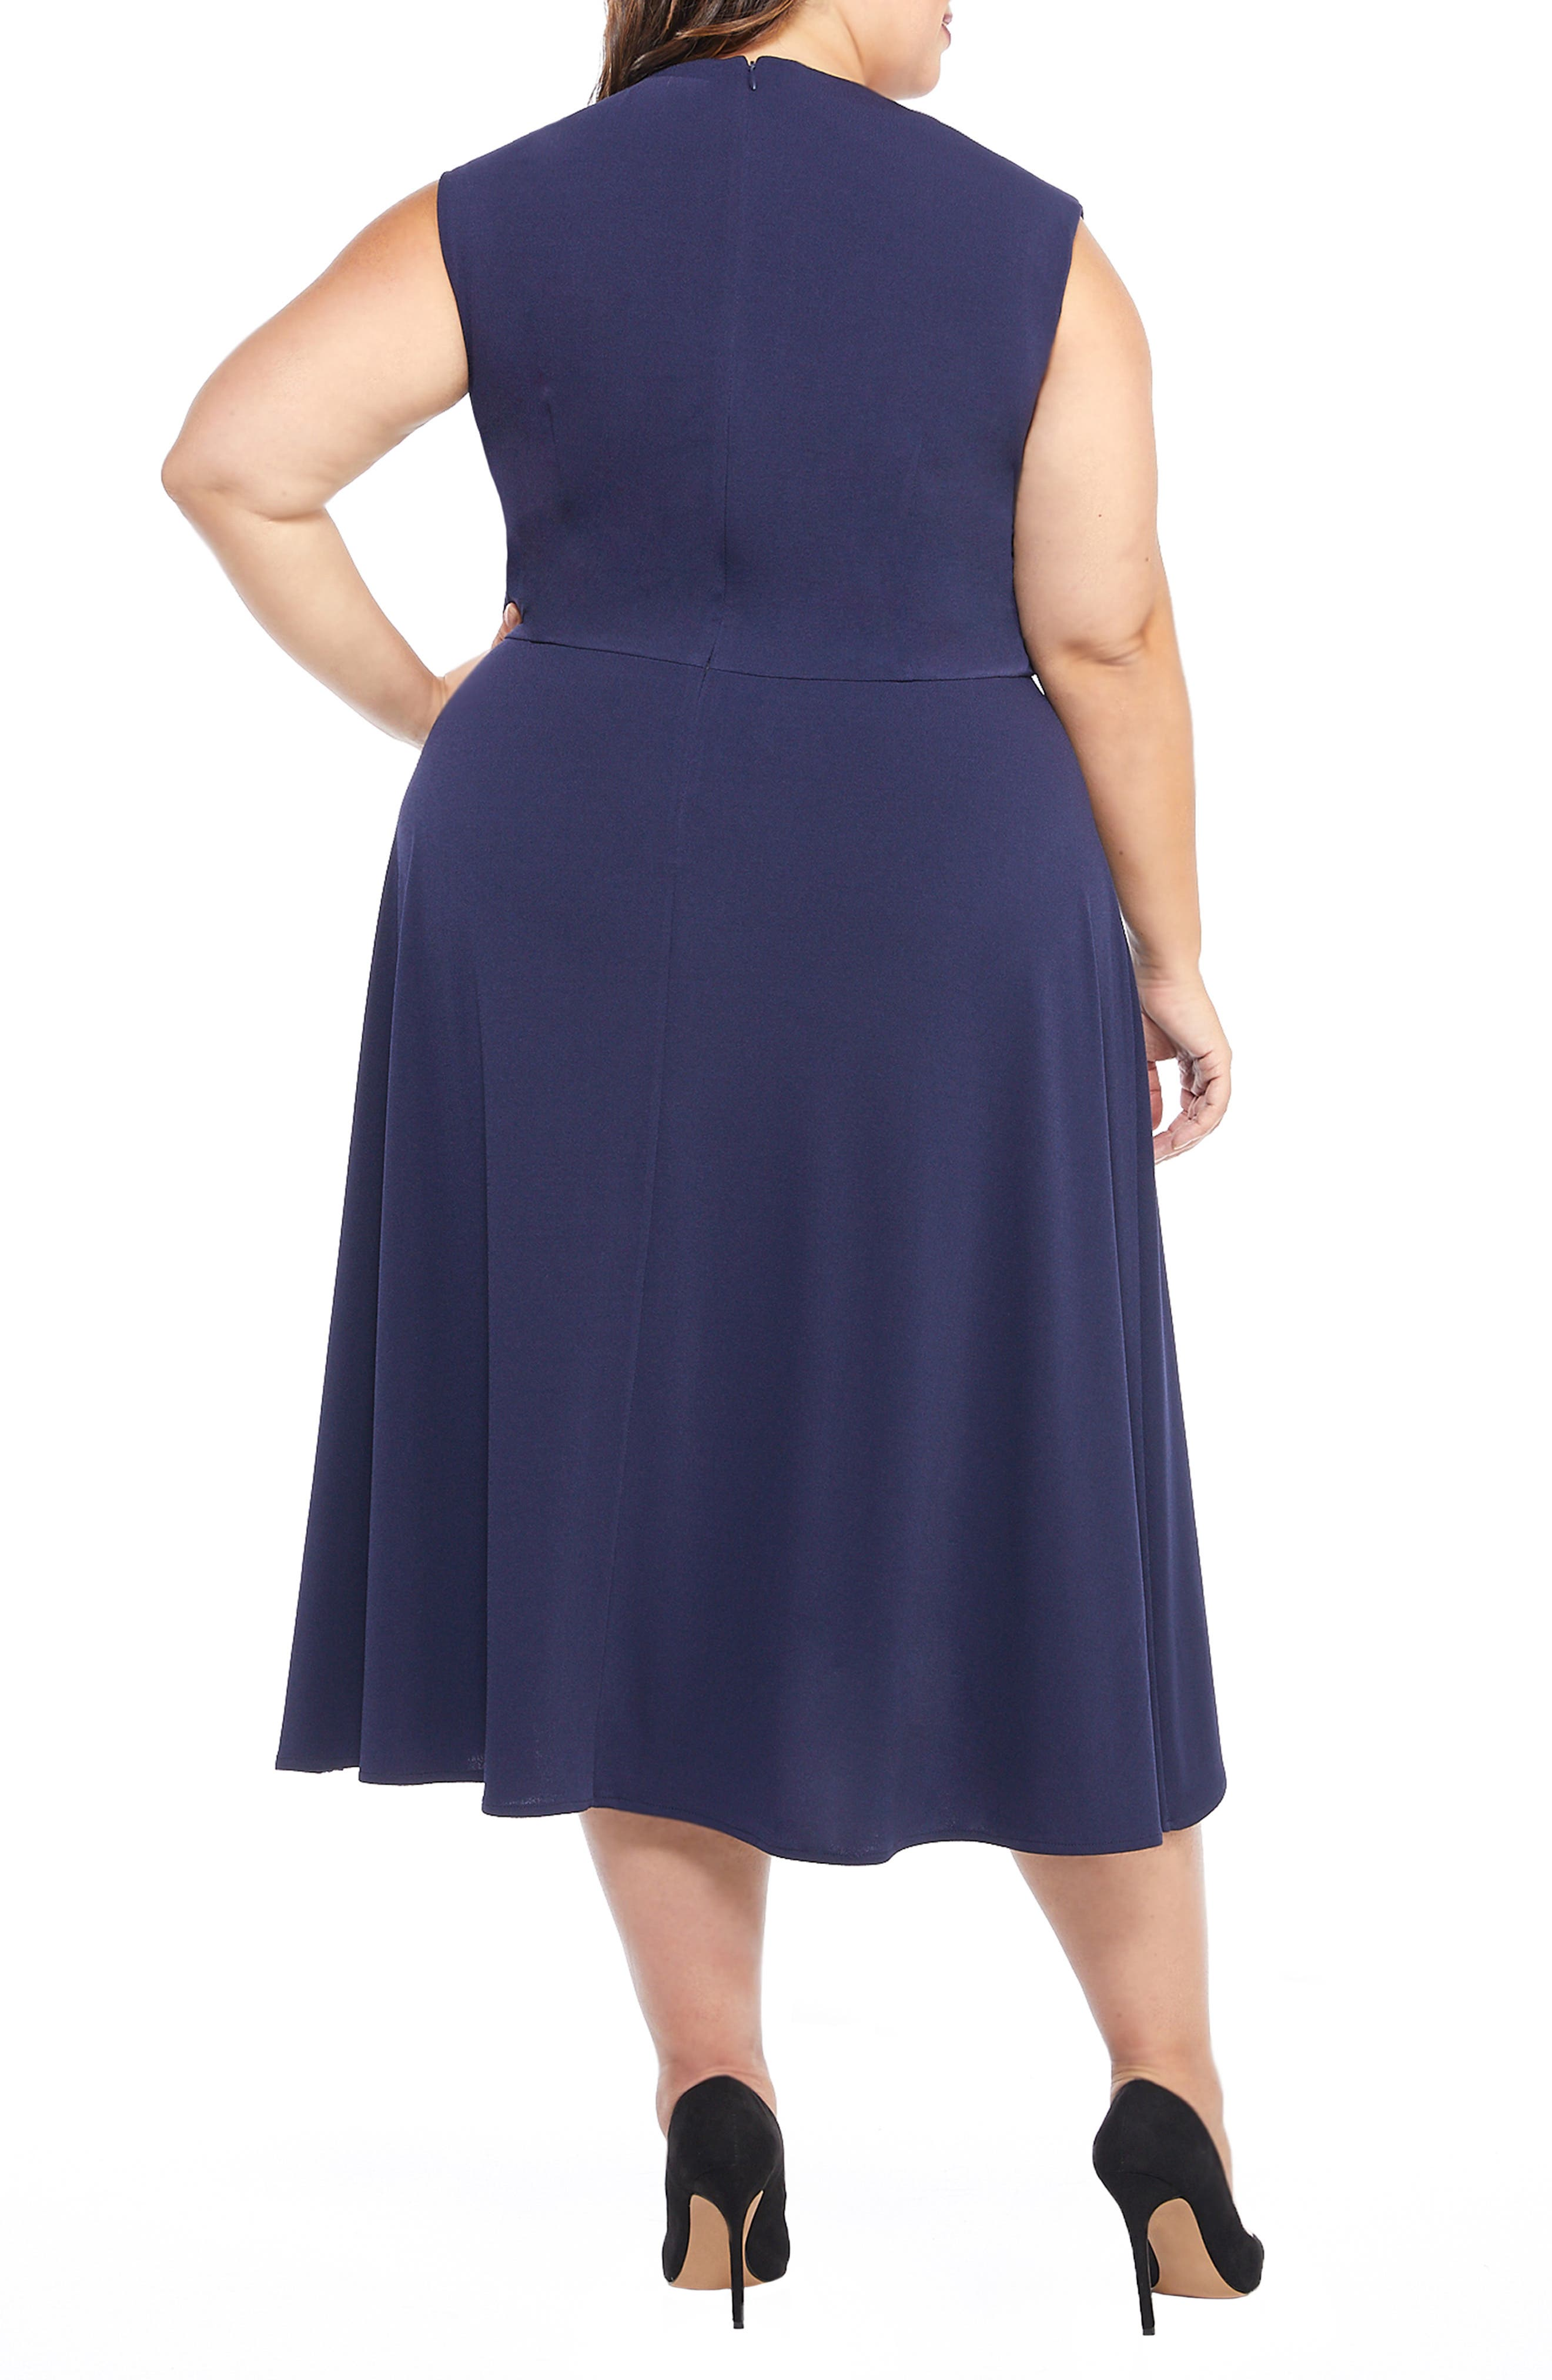 MAGGY LONDON, Crystal Side Drape Crepe Midi Dress, Alternate thumbnail 2, color, 460